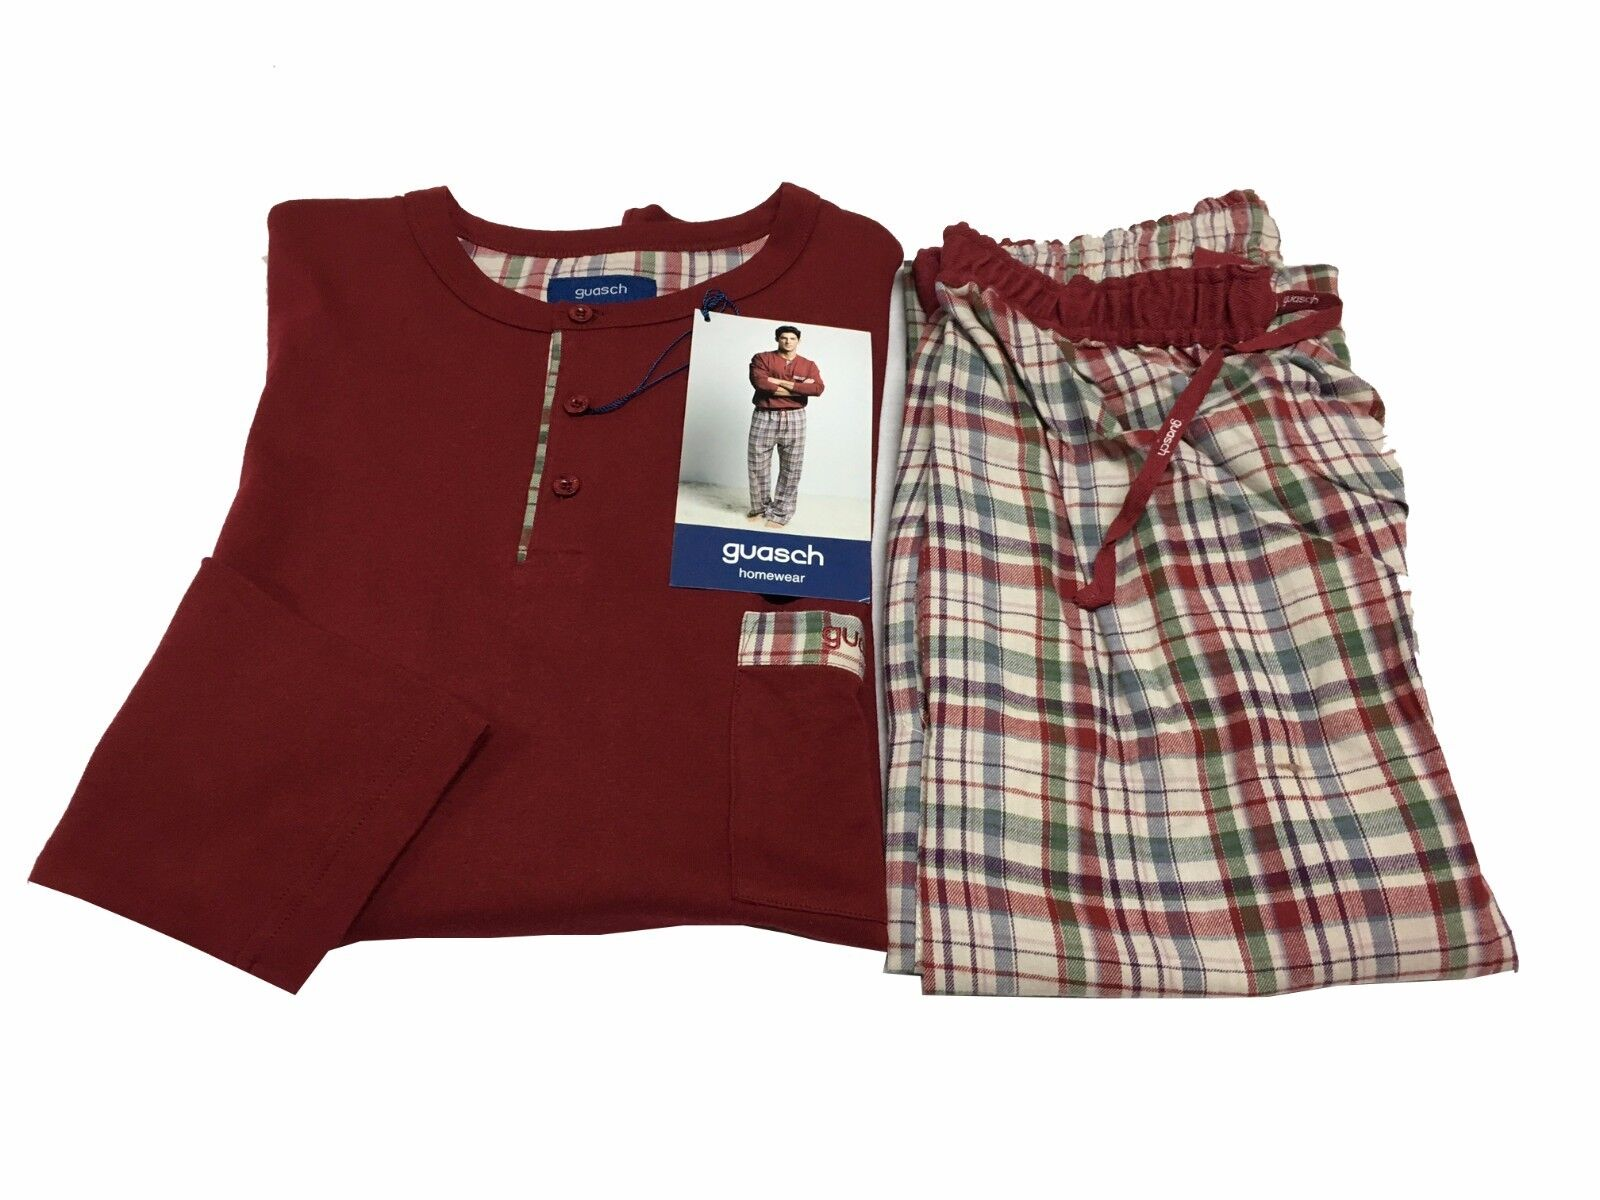 74802e7a268819 Herren Pyjamas Hose Flanell Stoff Bordeaux 100% Baumwolle Guasch Kader  npzieb972-neue Kleidung